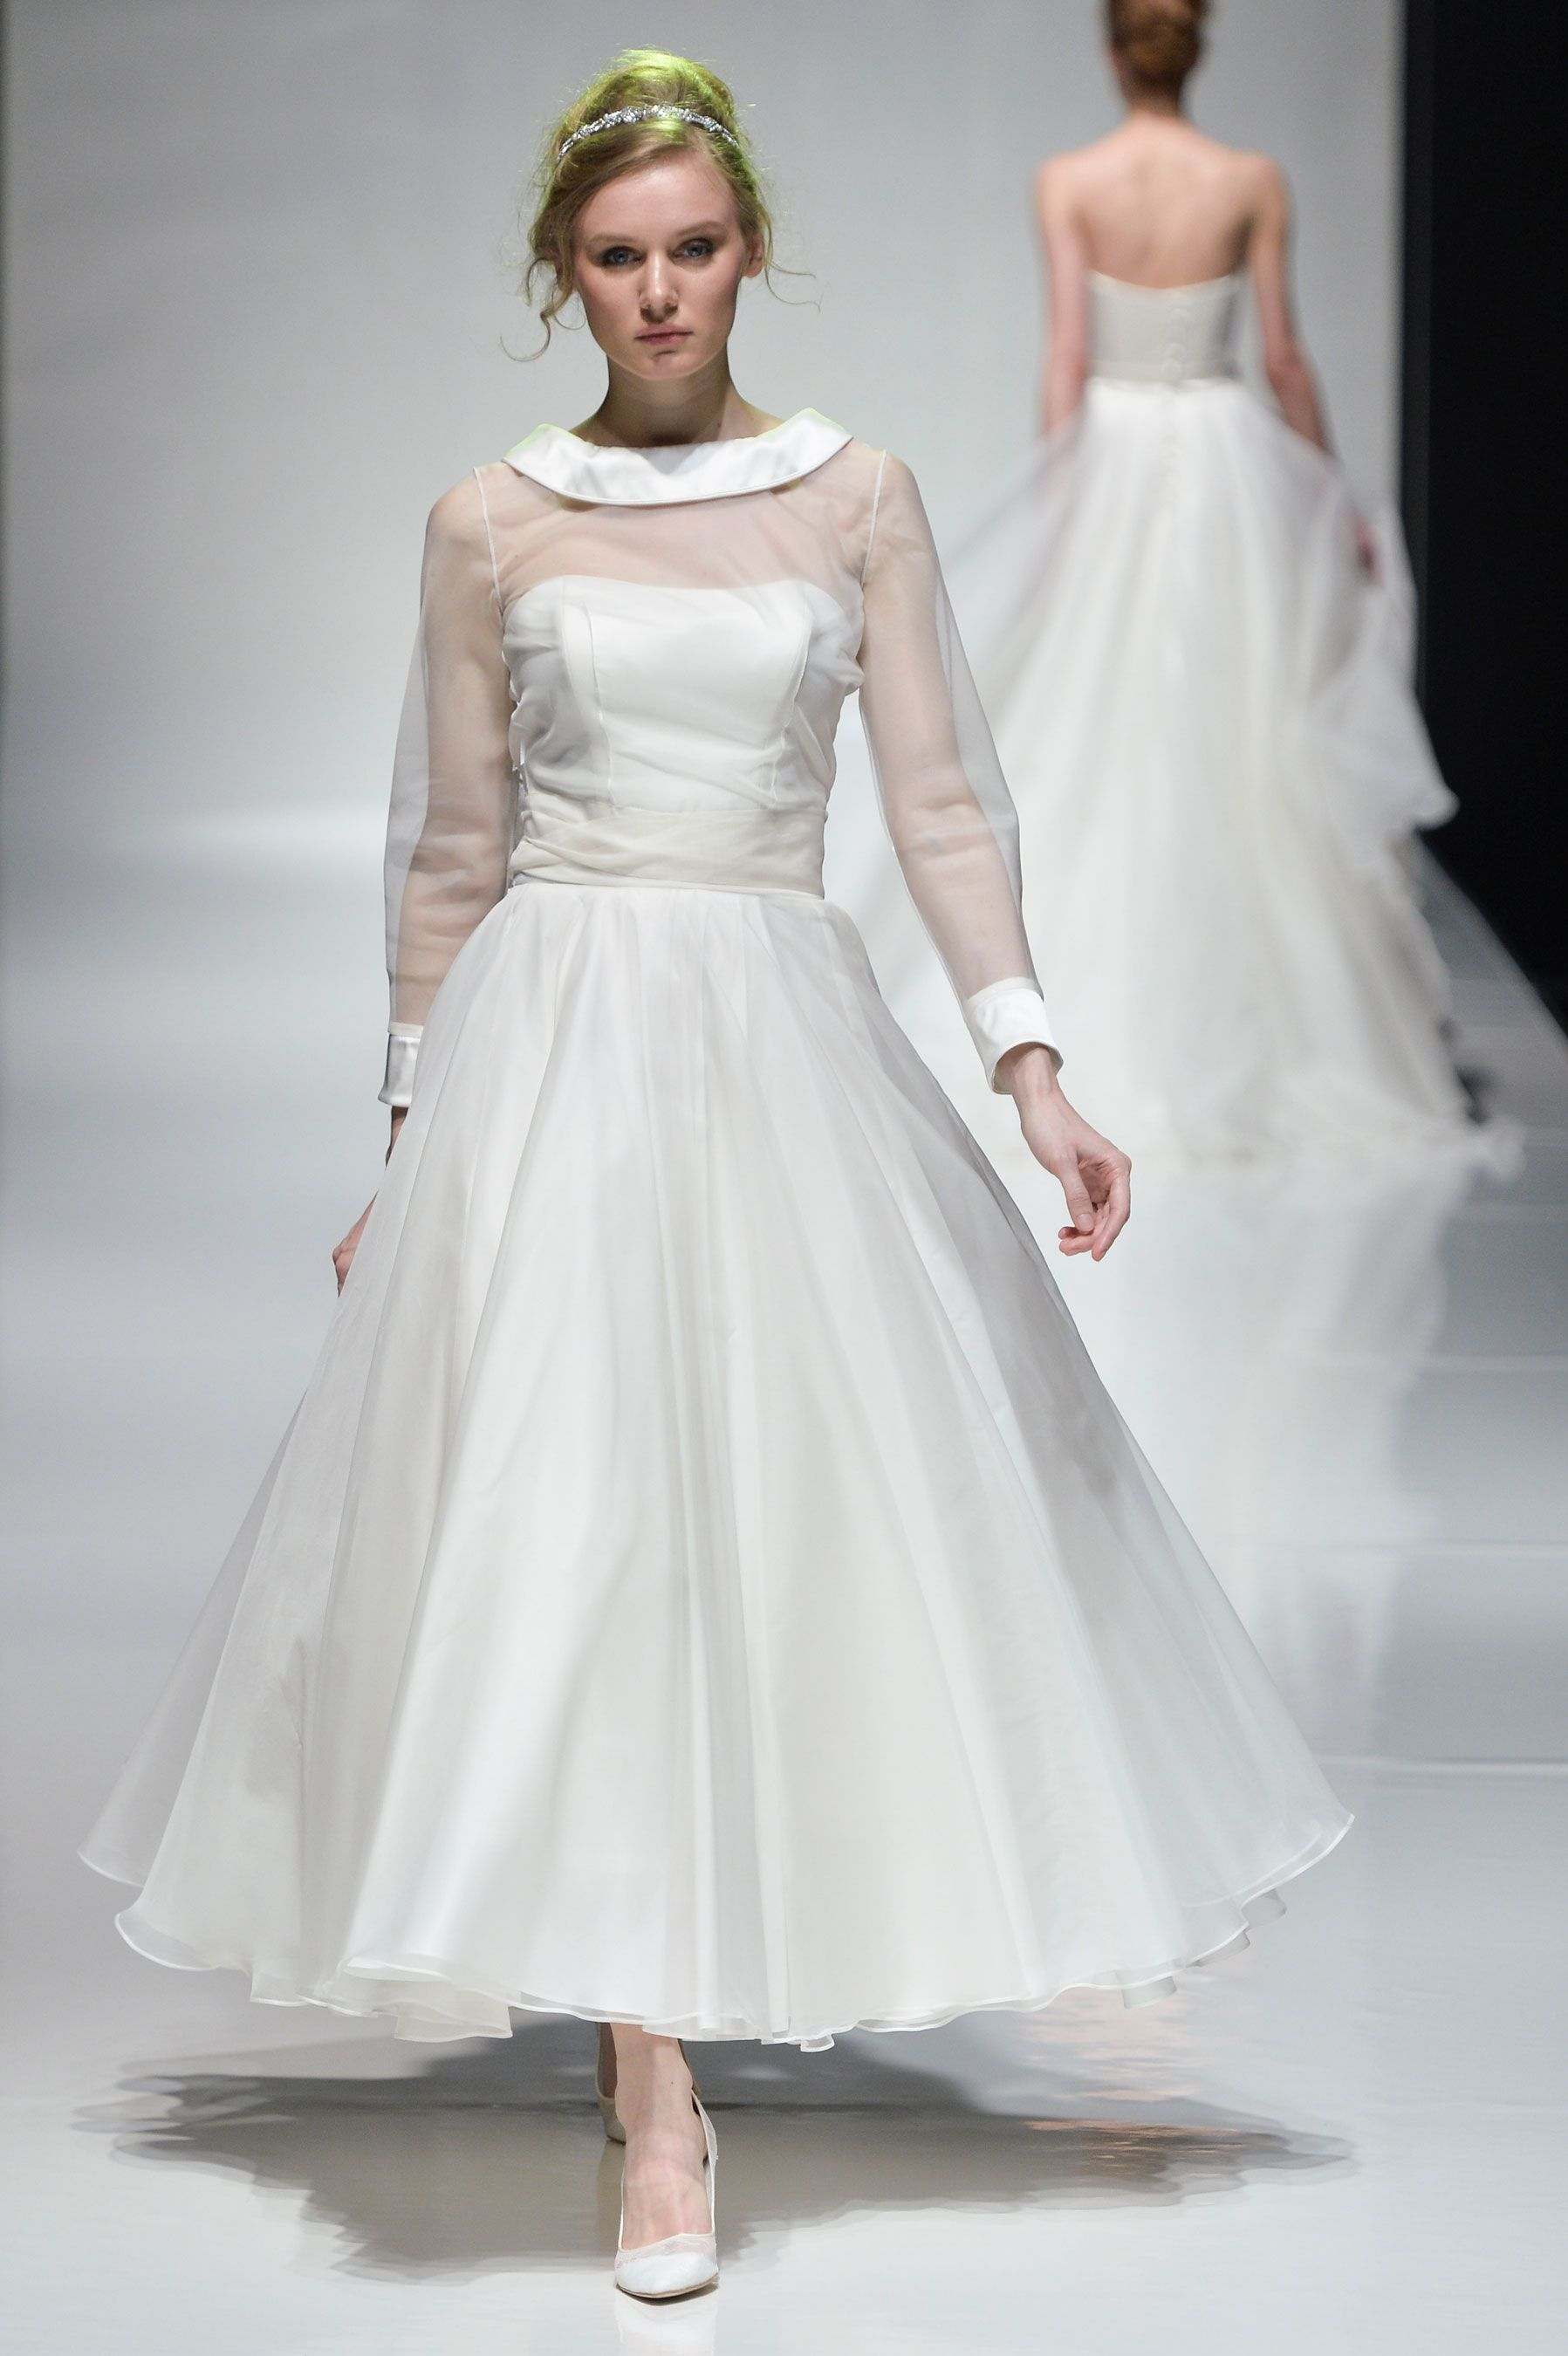 Oprah wedding dresses  Suknie ślubne  Qiana Q wiosna  fot Imaxtree  Future